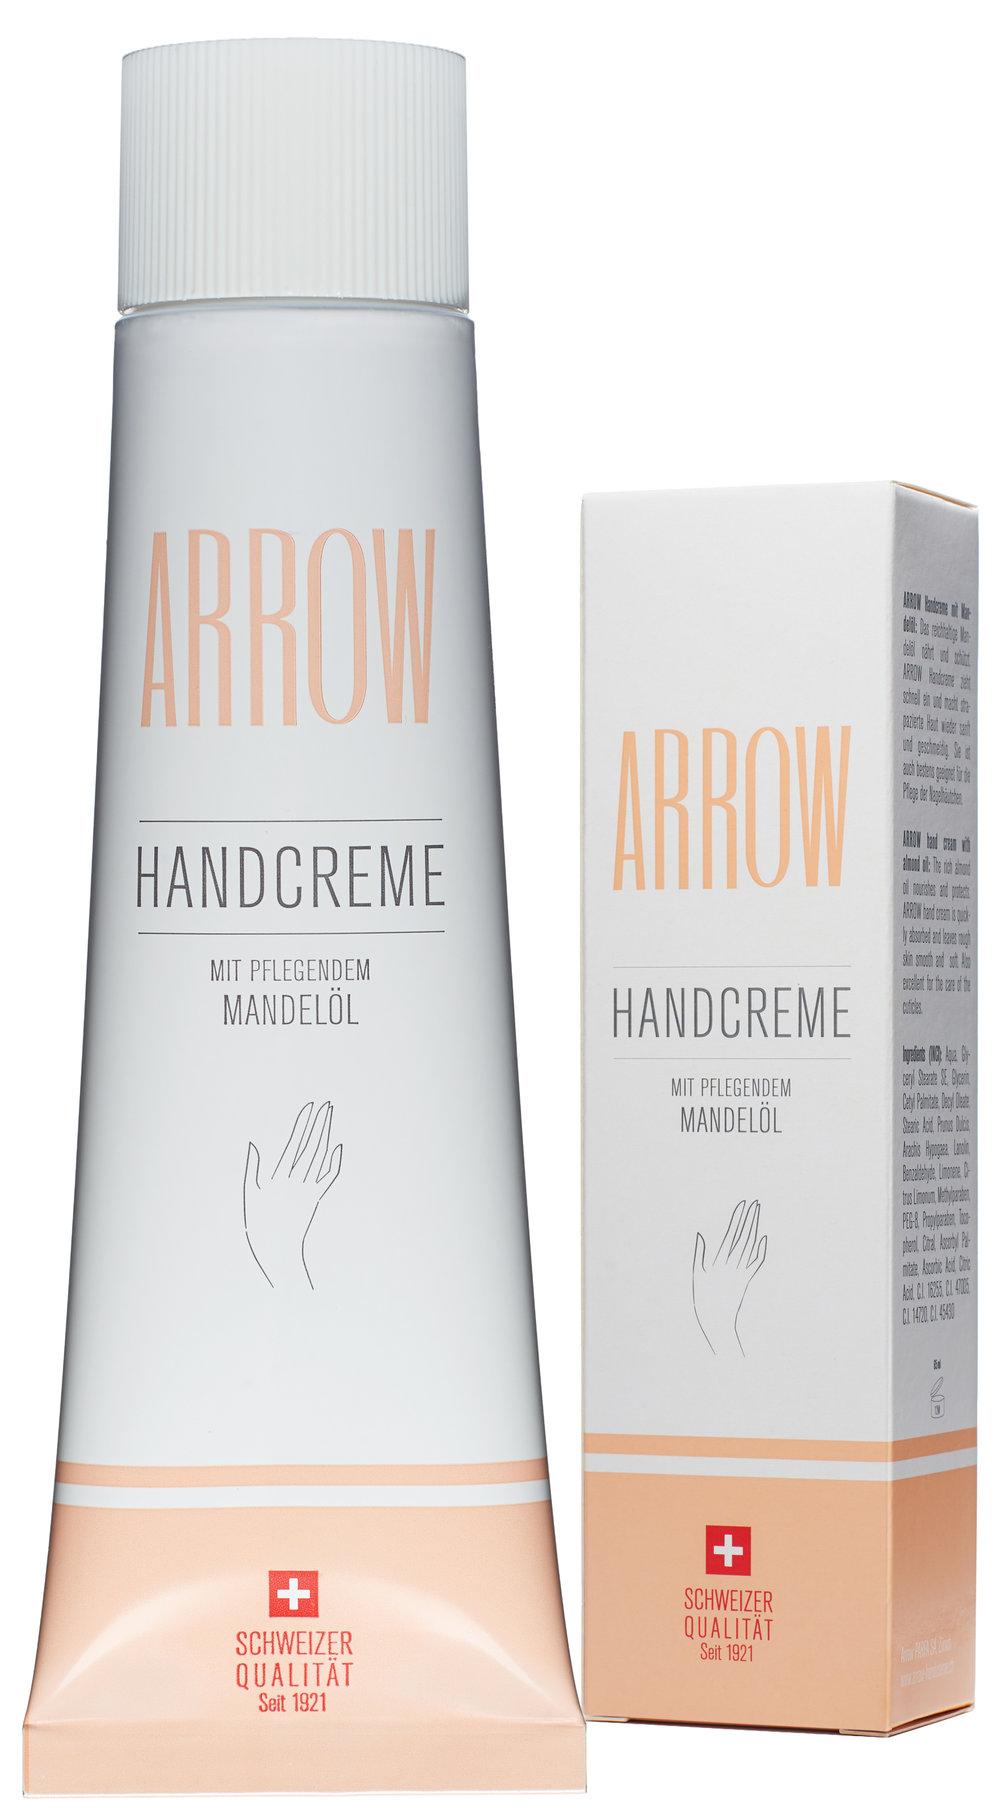 ARROW Handcreme mit pflegendem Mandelöl